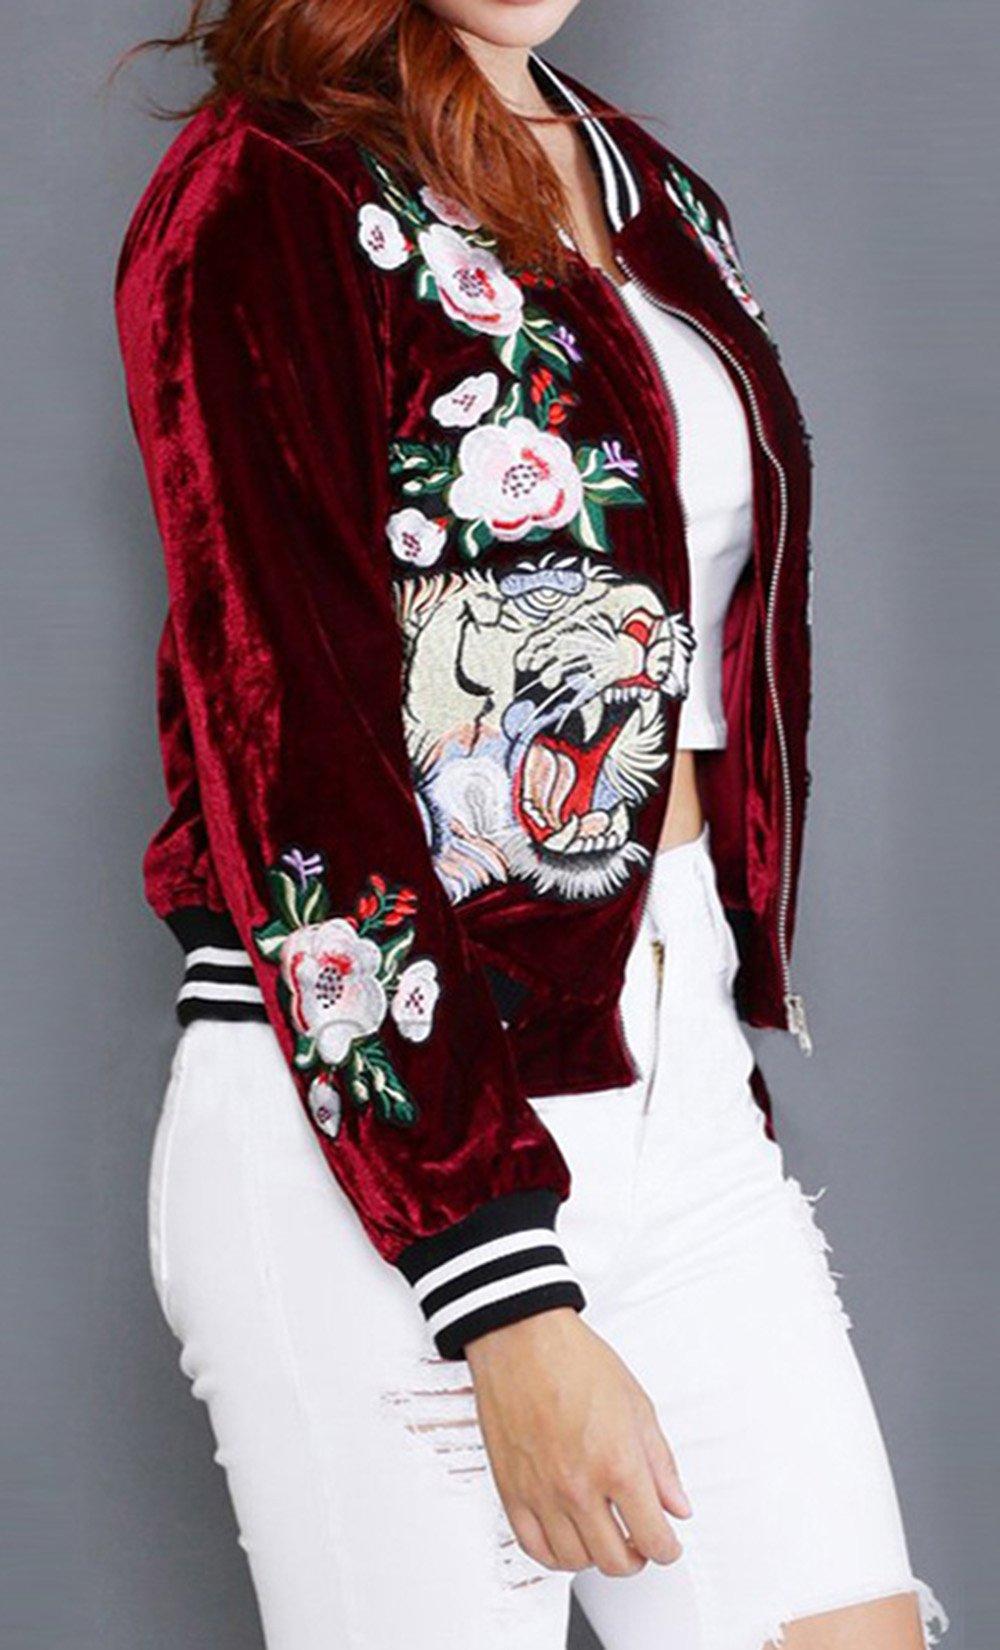 Farktop Women's Embroidery Patch Velvet Classic Biker Quilted Bomber Flight Jacket,Jacket-red,Large by Farktop (Image #5)